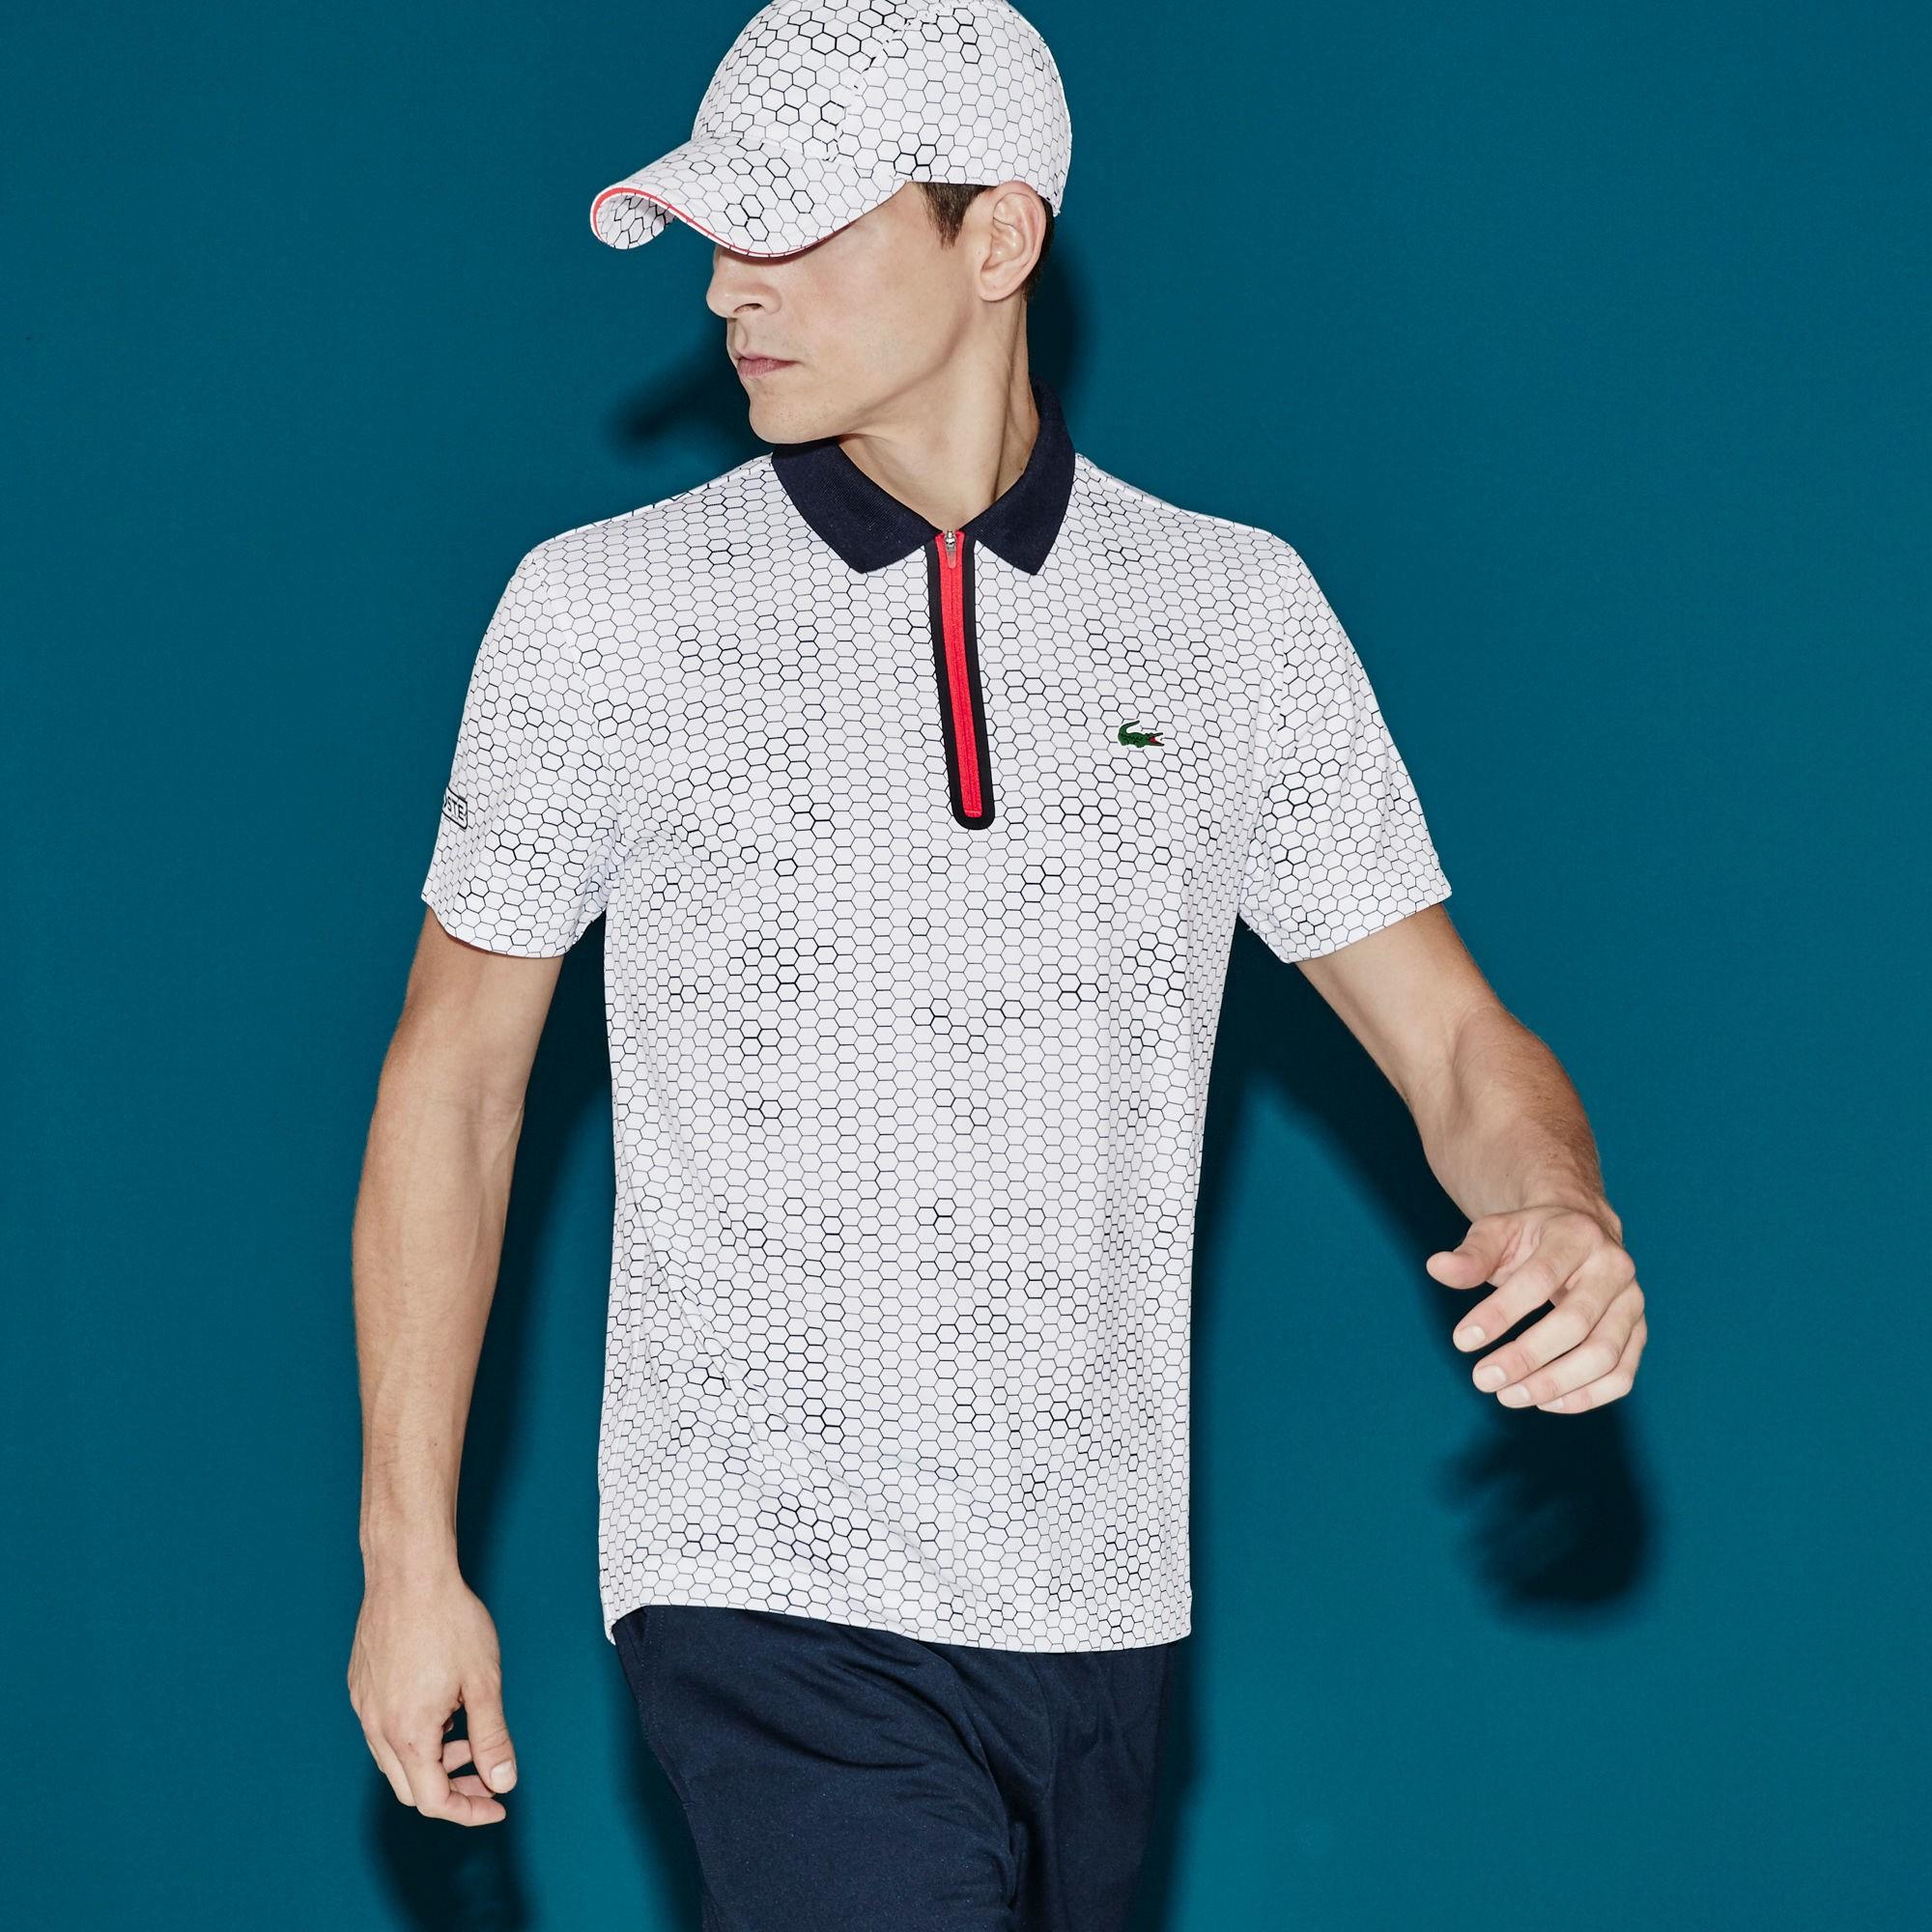 94b8810ca Lacoste Men s Sport Ultra Dry Zip Tennis Polo Shirt - White Navy Blue- Corrida